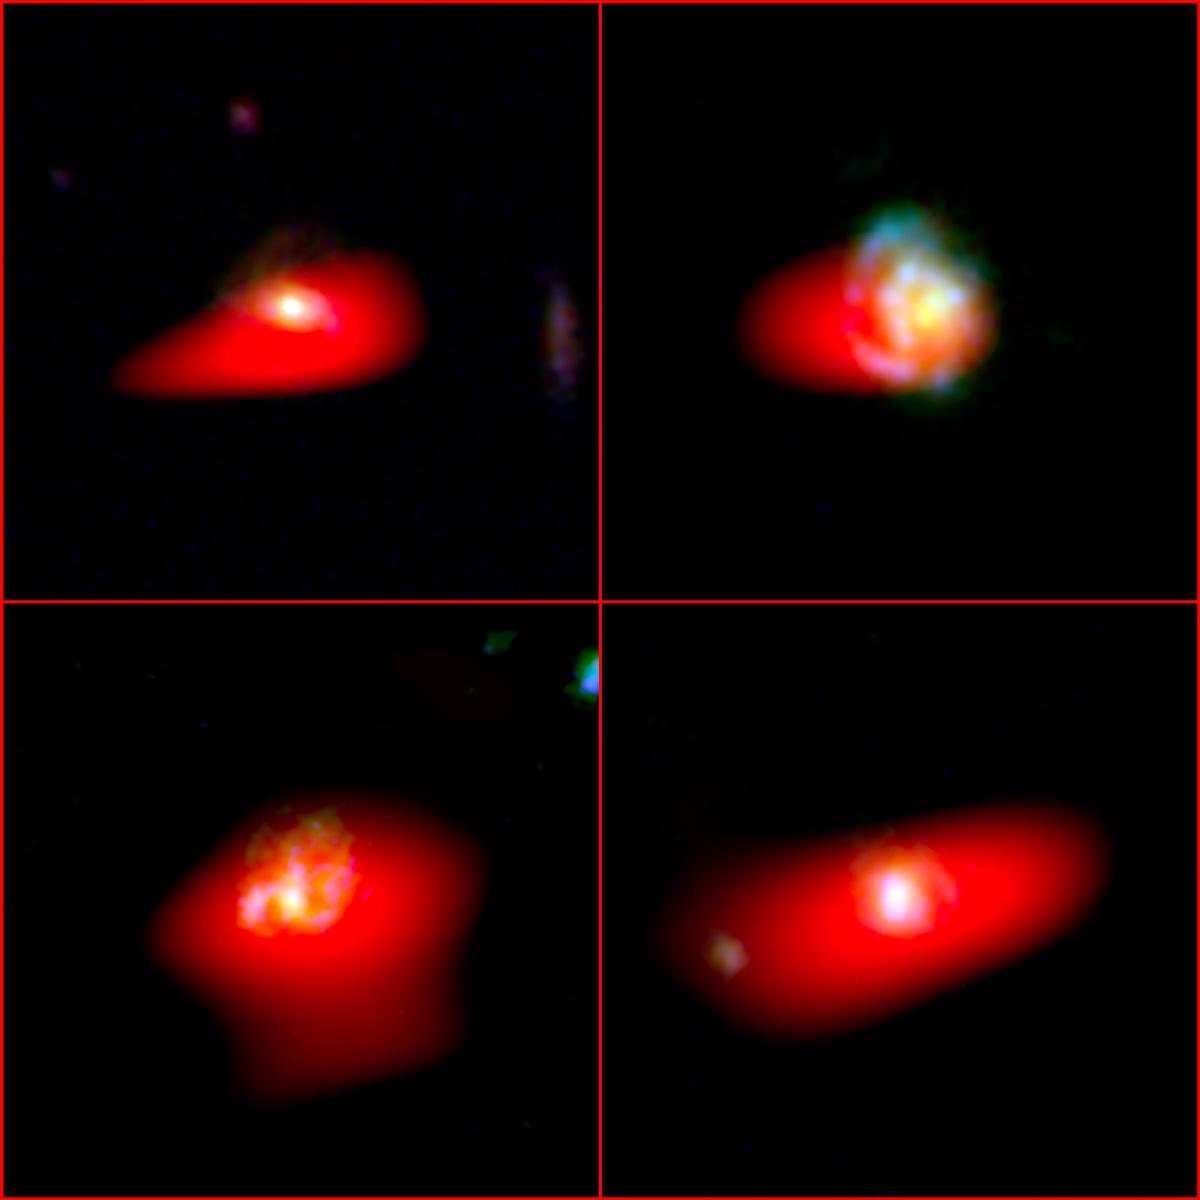 Galaxias similares a la Vía Láctea